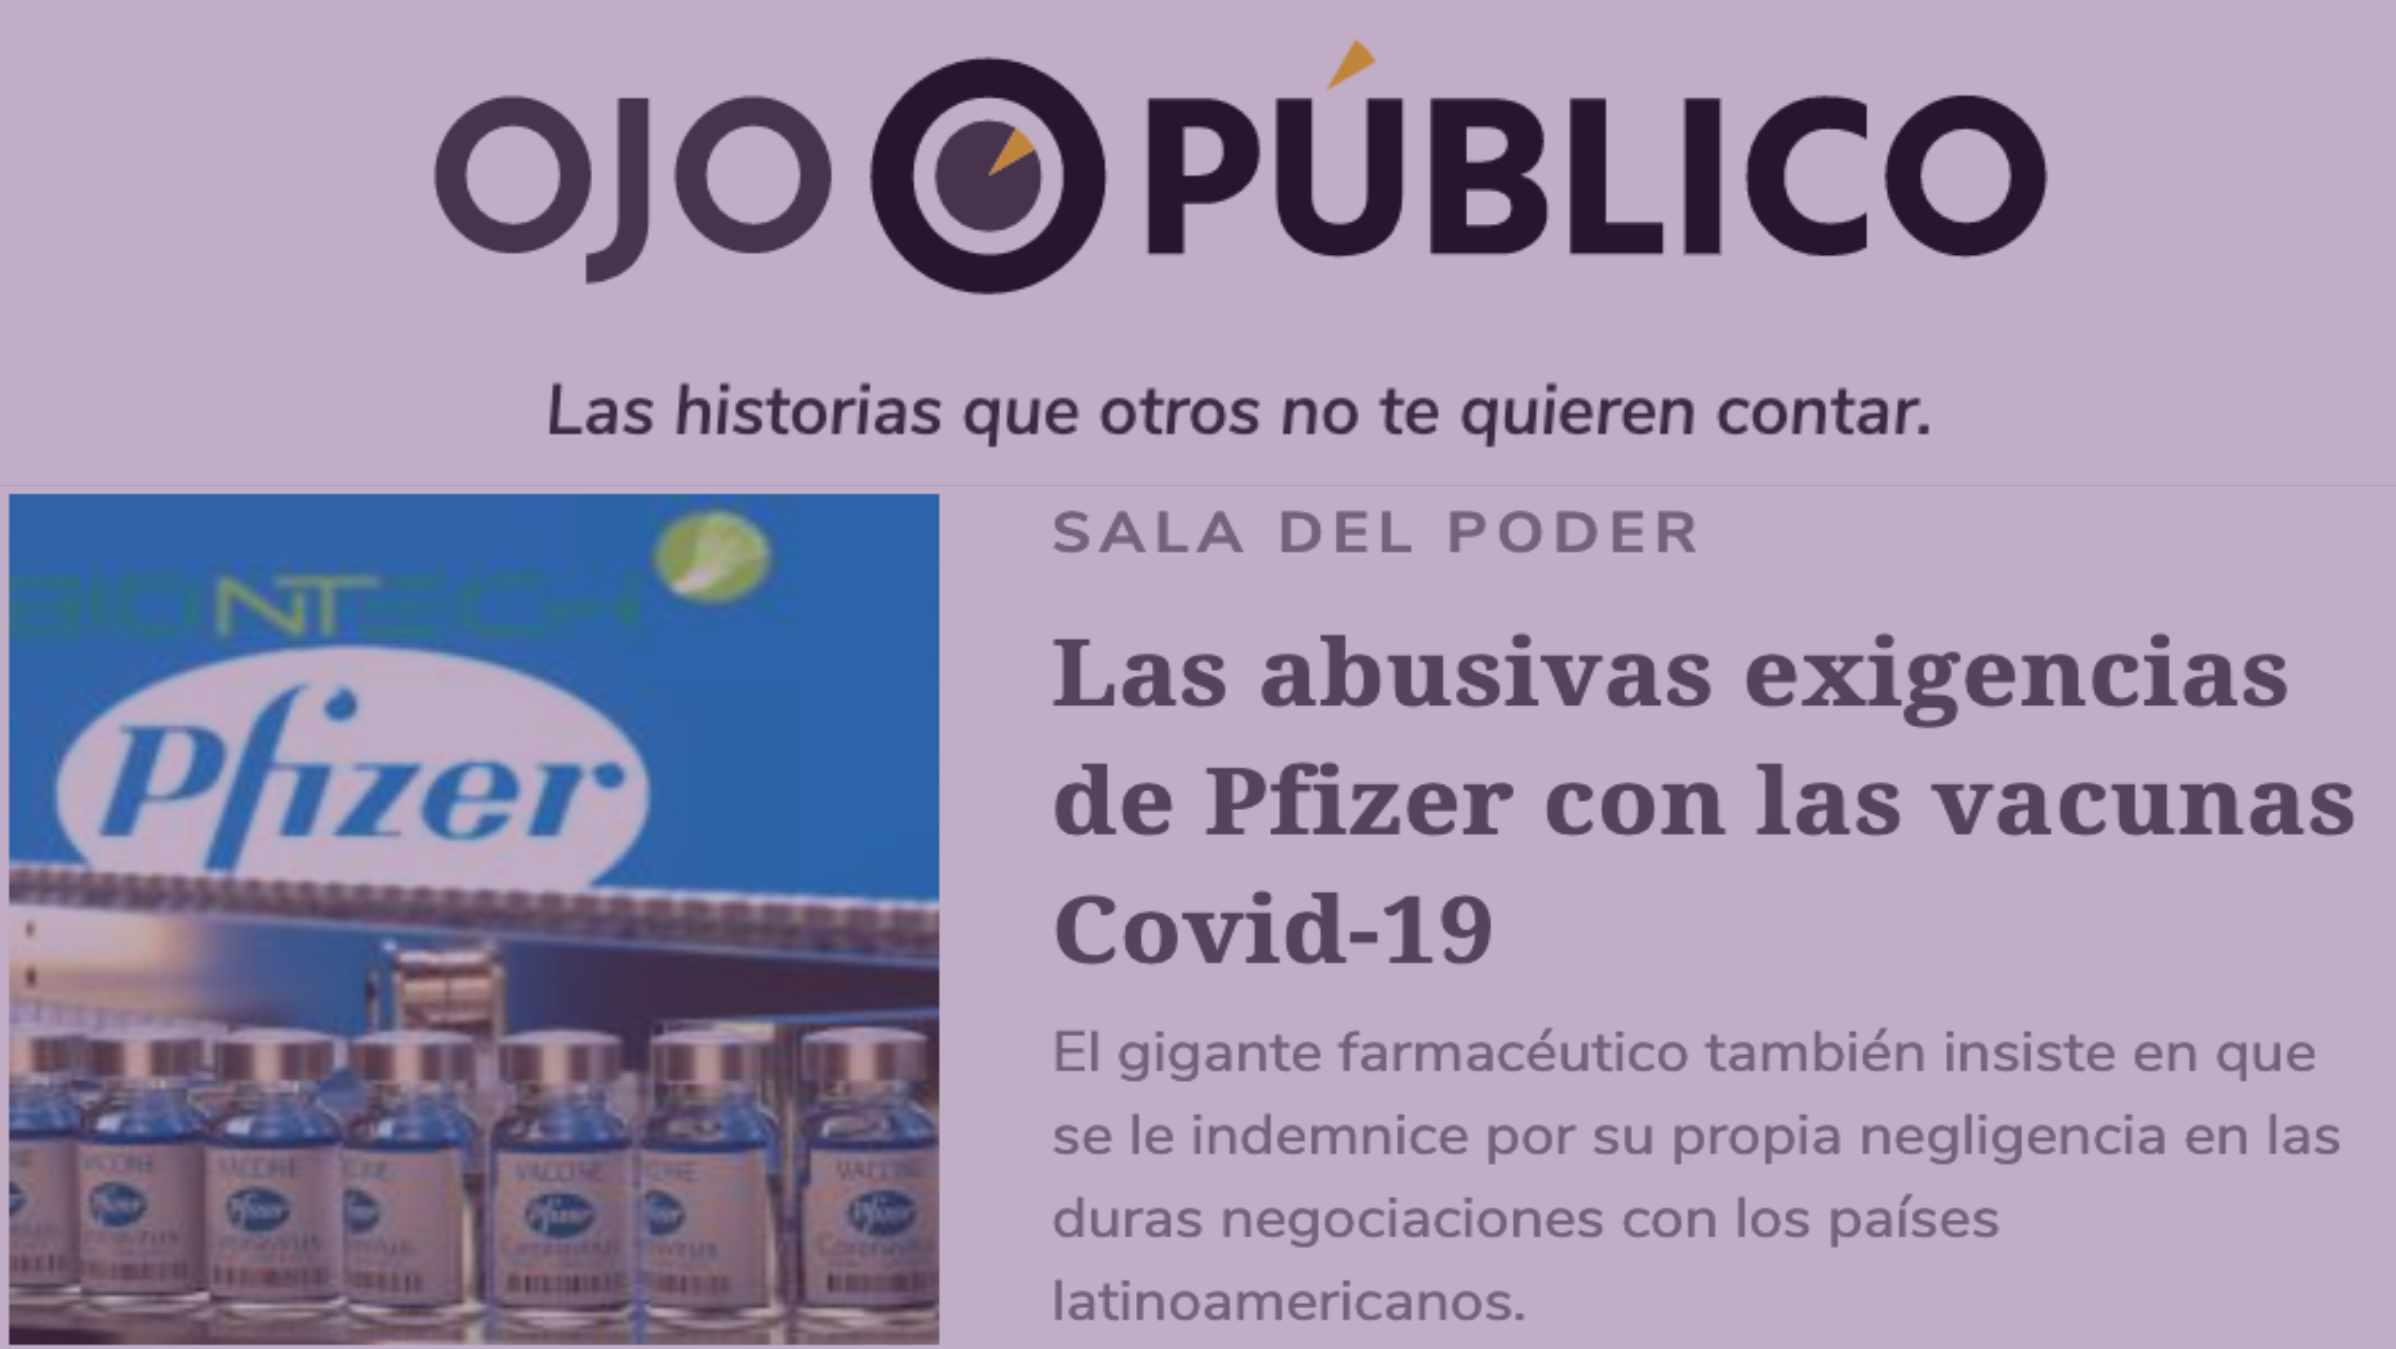 Abusiva venta de Pfizer a países latinoamericanos